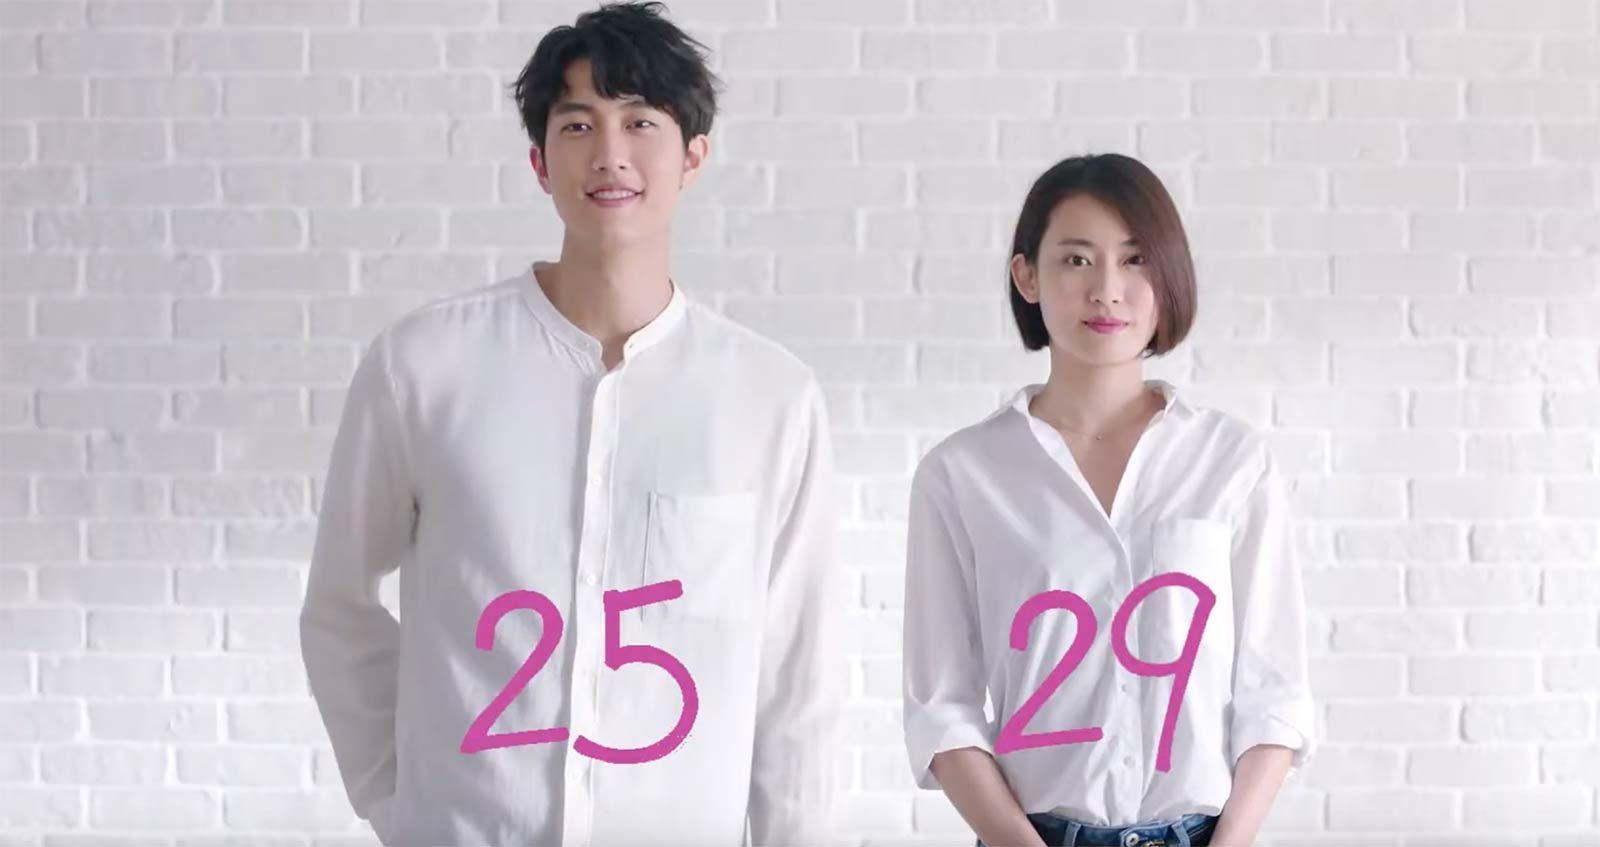 Photo of [نقاش مستخدمي الإنترنت] لماذا نادرا ما نجد امرأة تقبل بمواعدة رجل أصغر عمرا منها؟